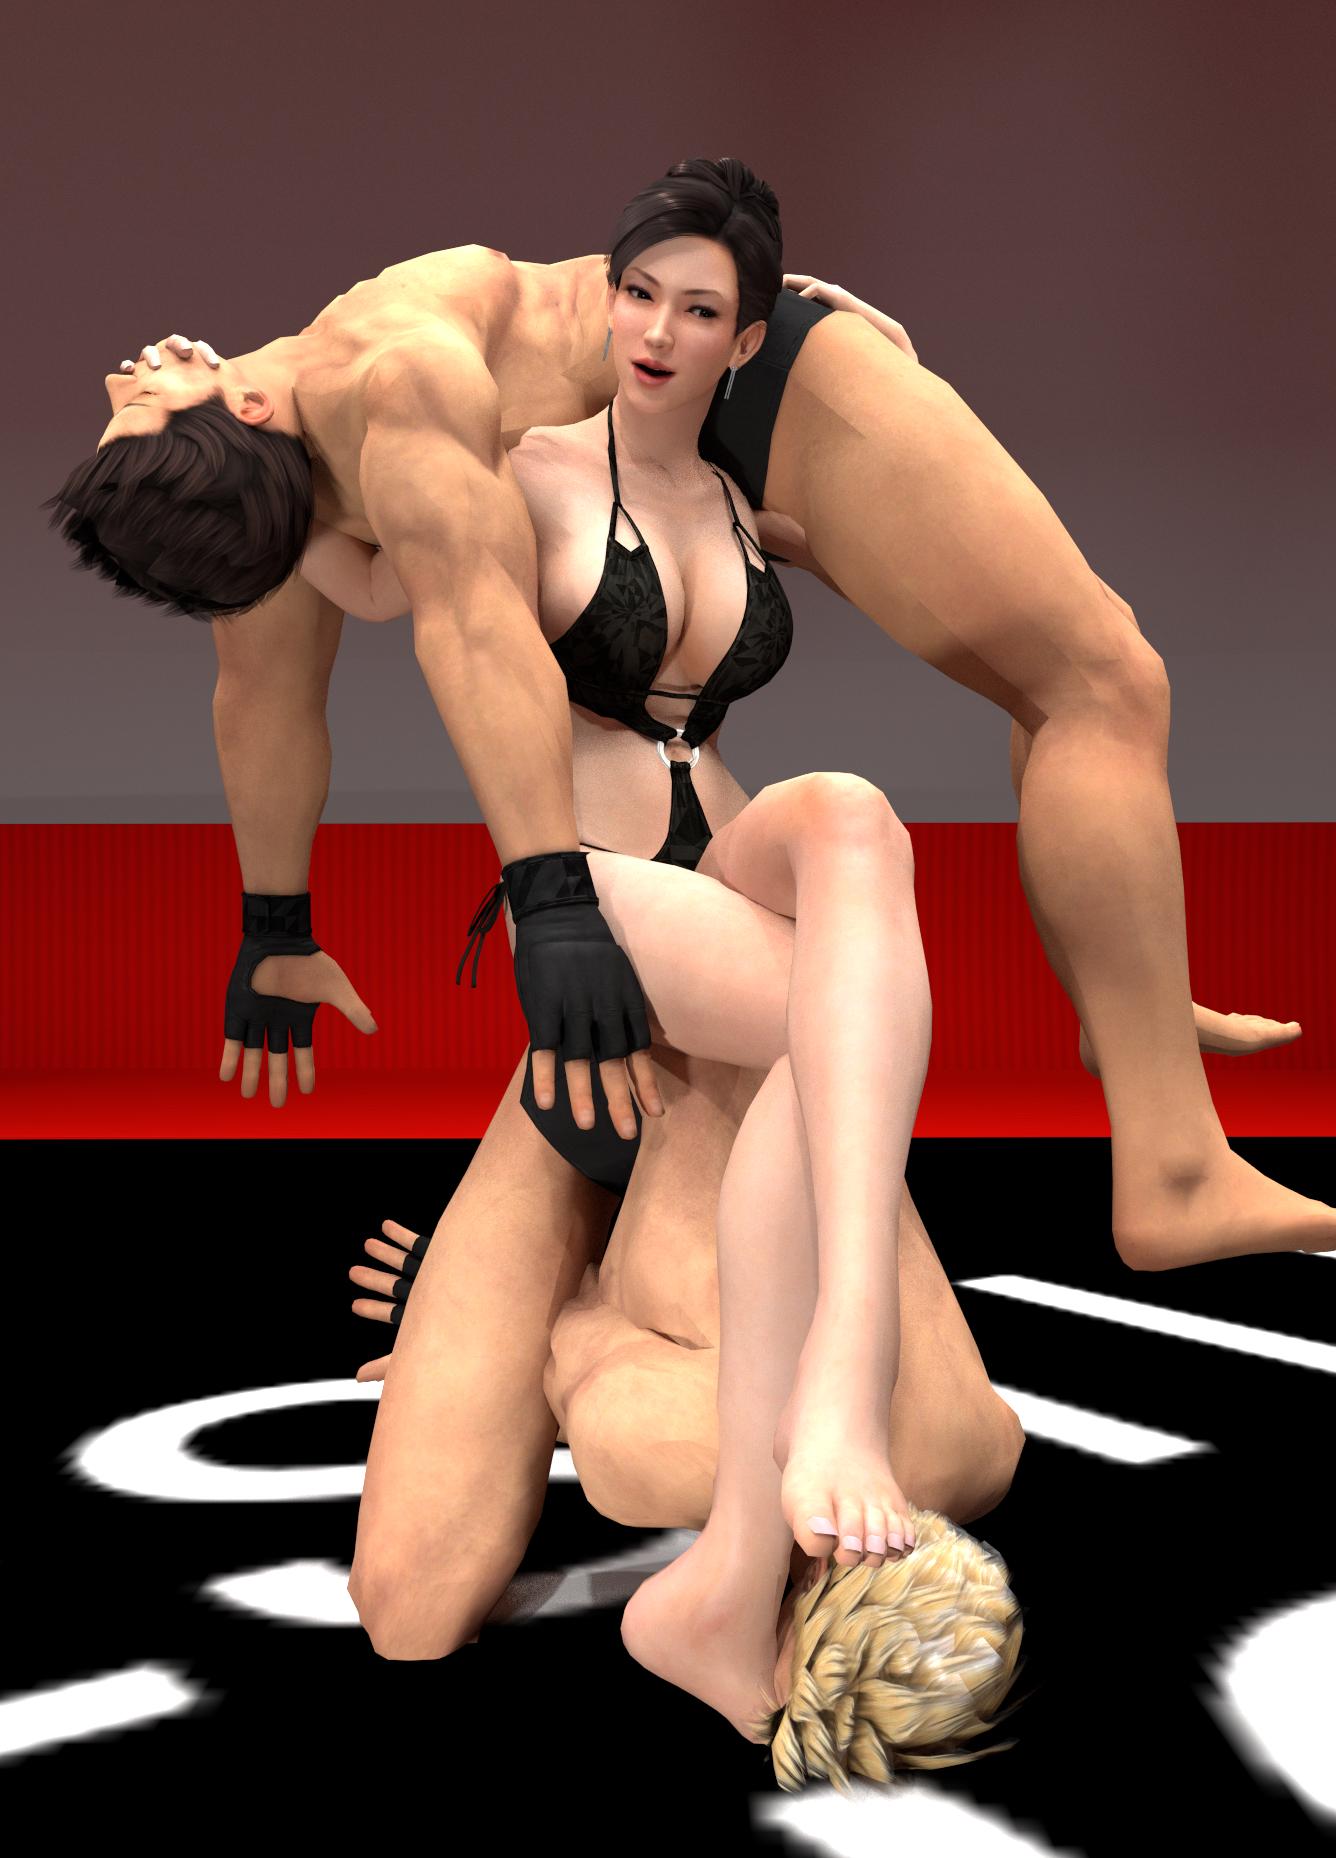 Wwe sex game